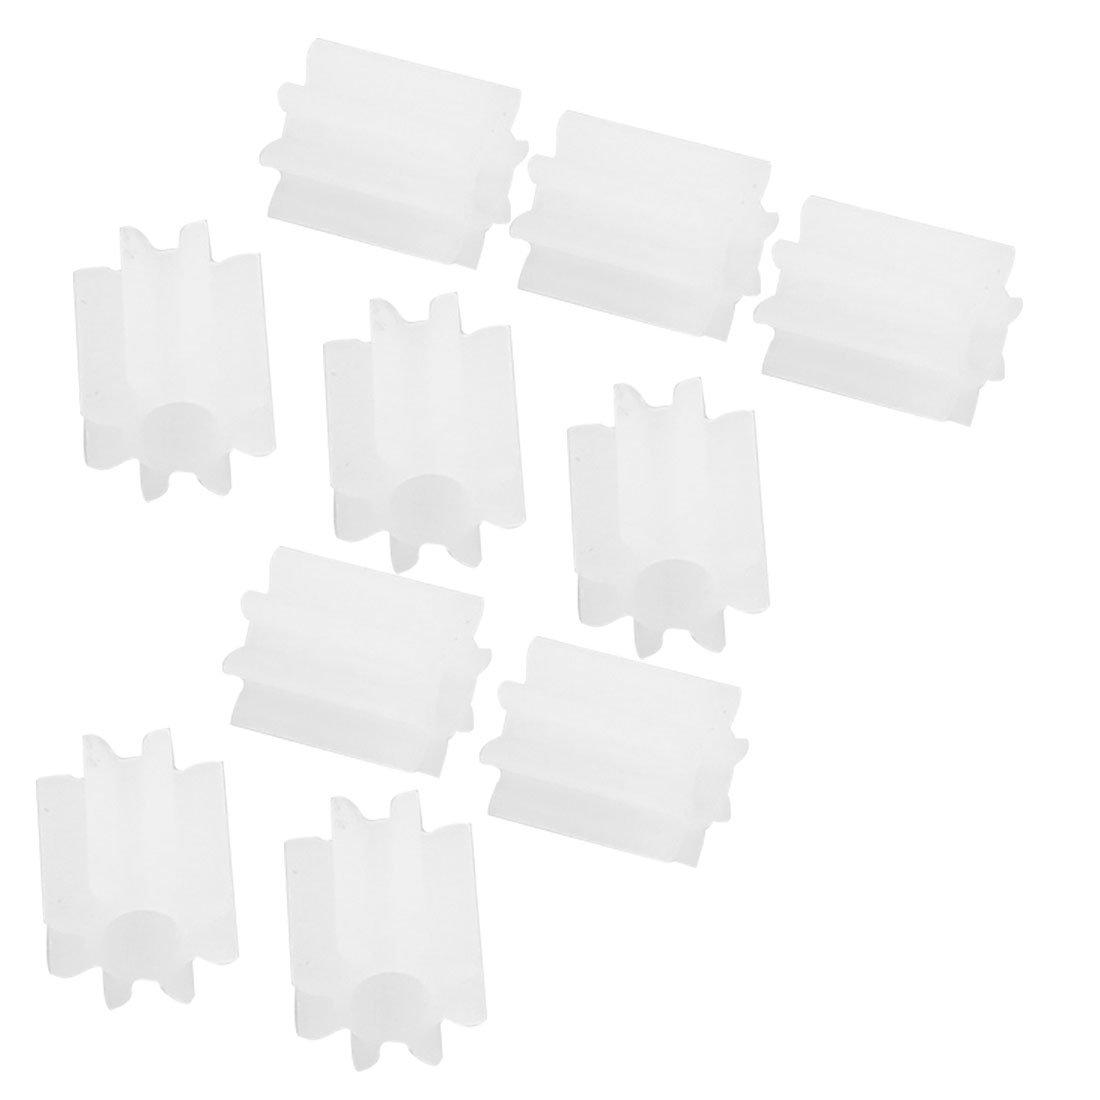 10 Pezzi Meccanismi Ingranaggi In Plastica Bianca Diametro Albero 2Mm 8 Denti Per Modelli Radiocomandati